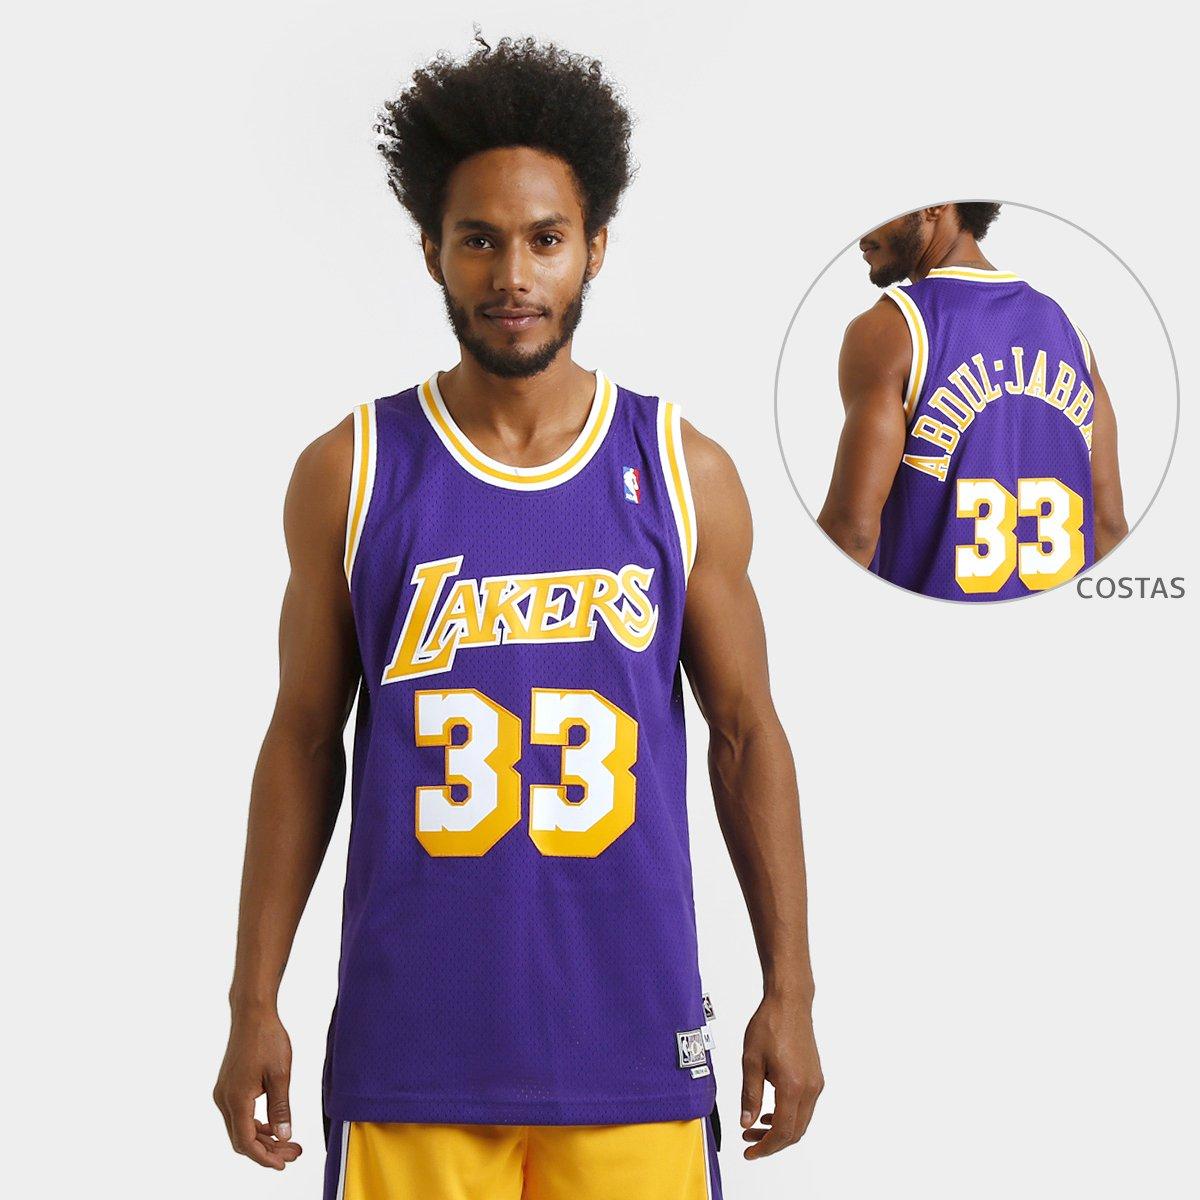 Camiseta Regata Adidas NBA Retired Los Angeles Lakers - Abdul Jabbar -  Compre Agora  03519ff040e